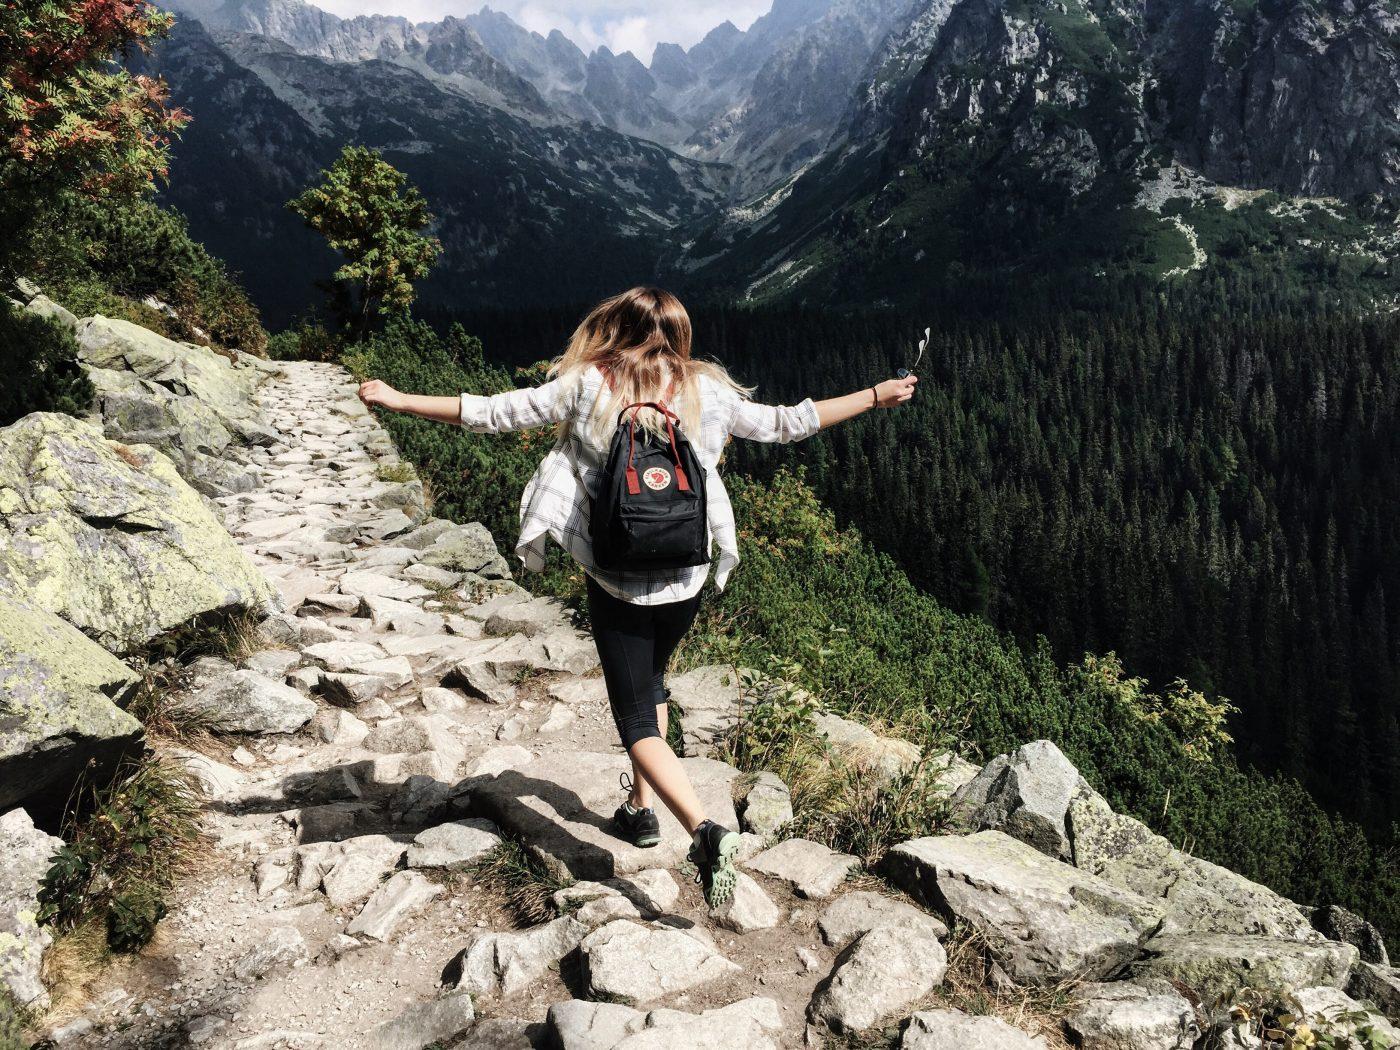 Minimalism: walking in the mountains